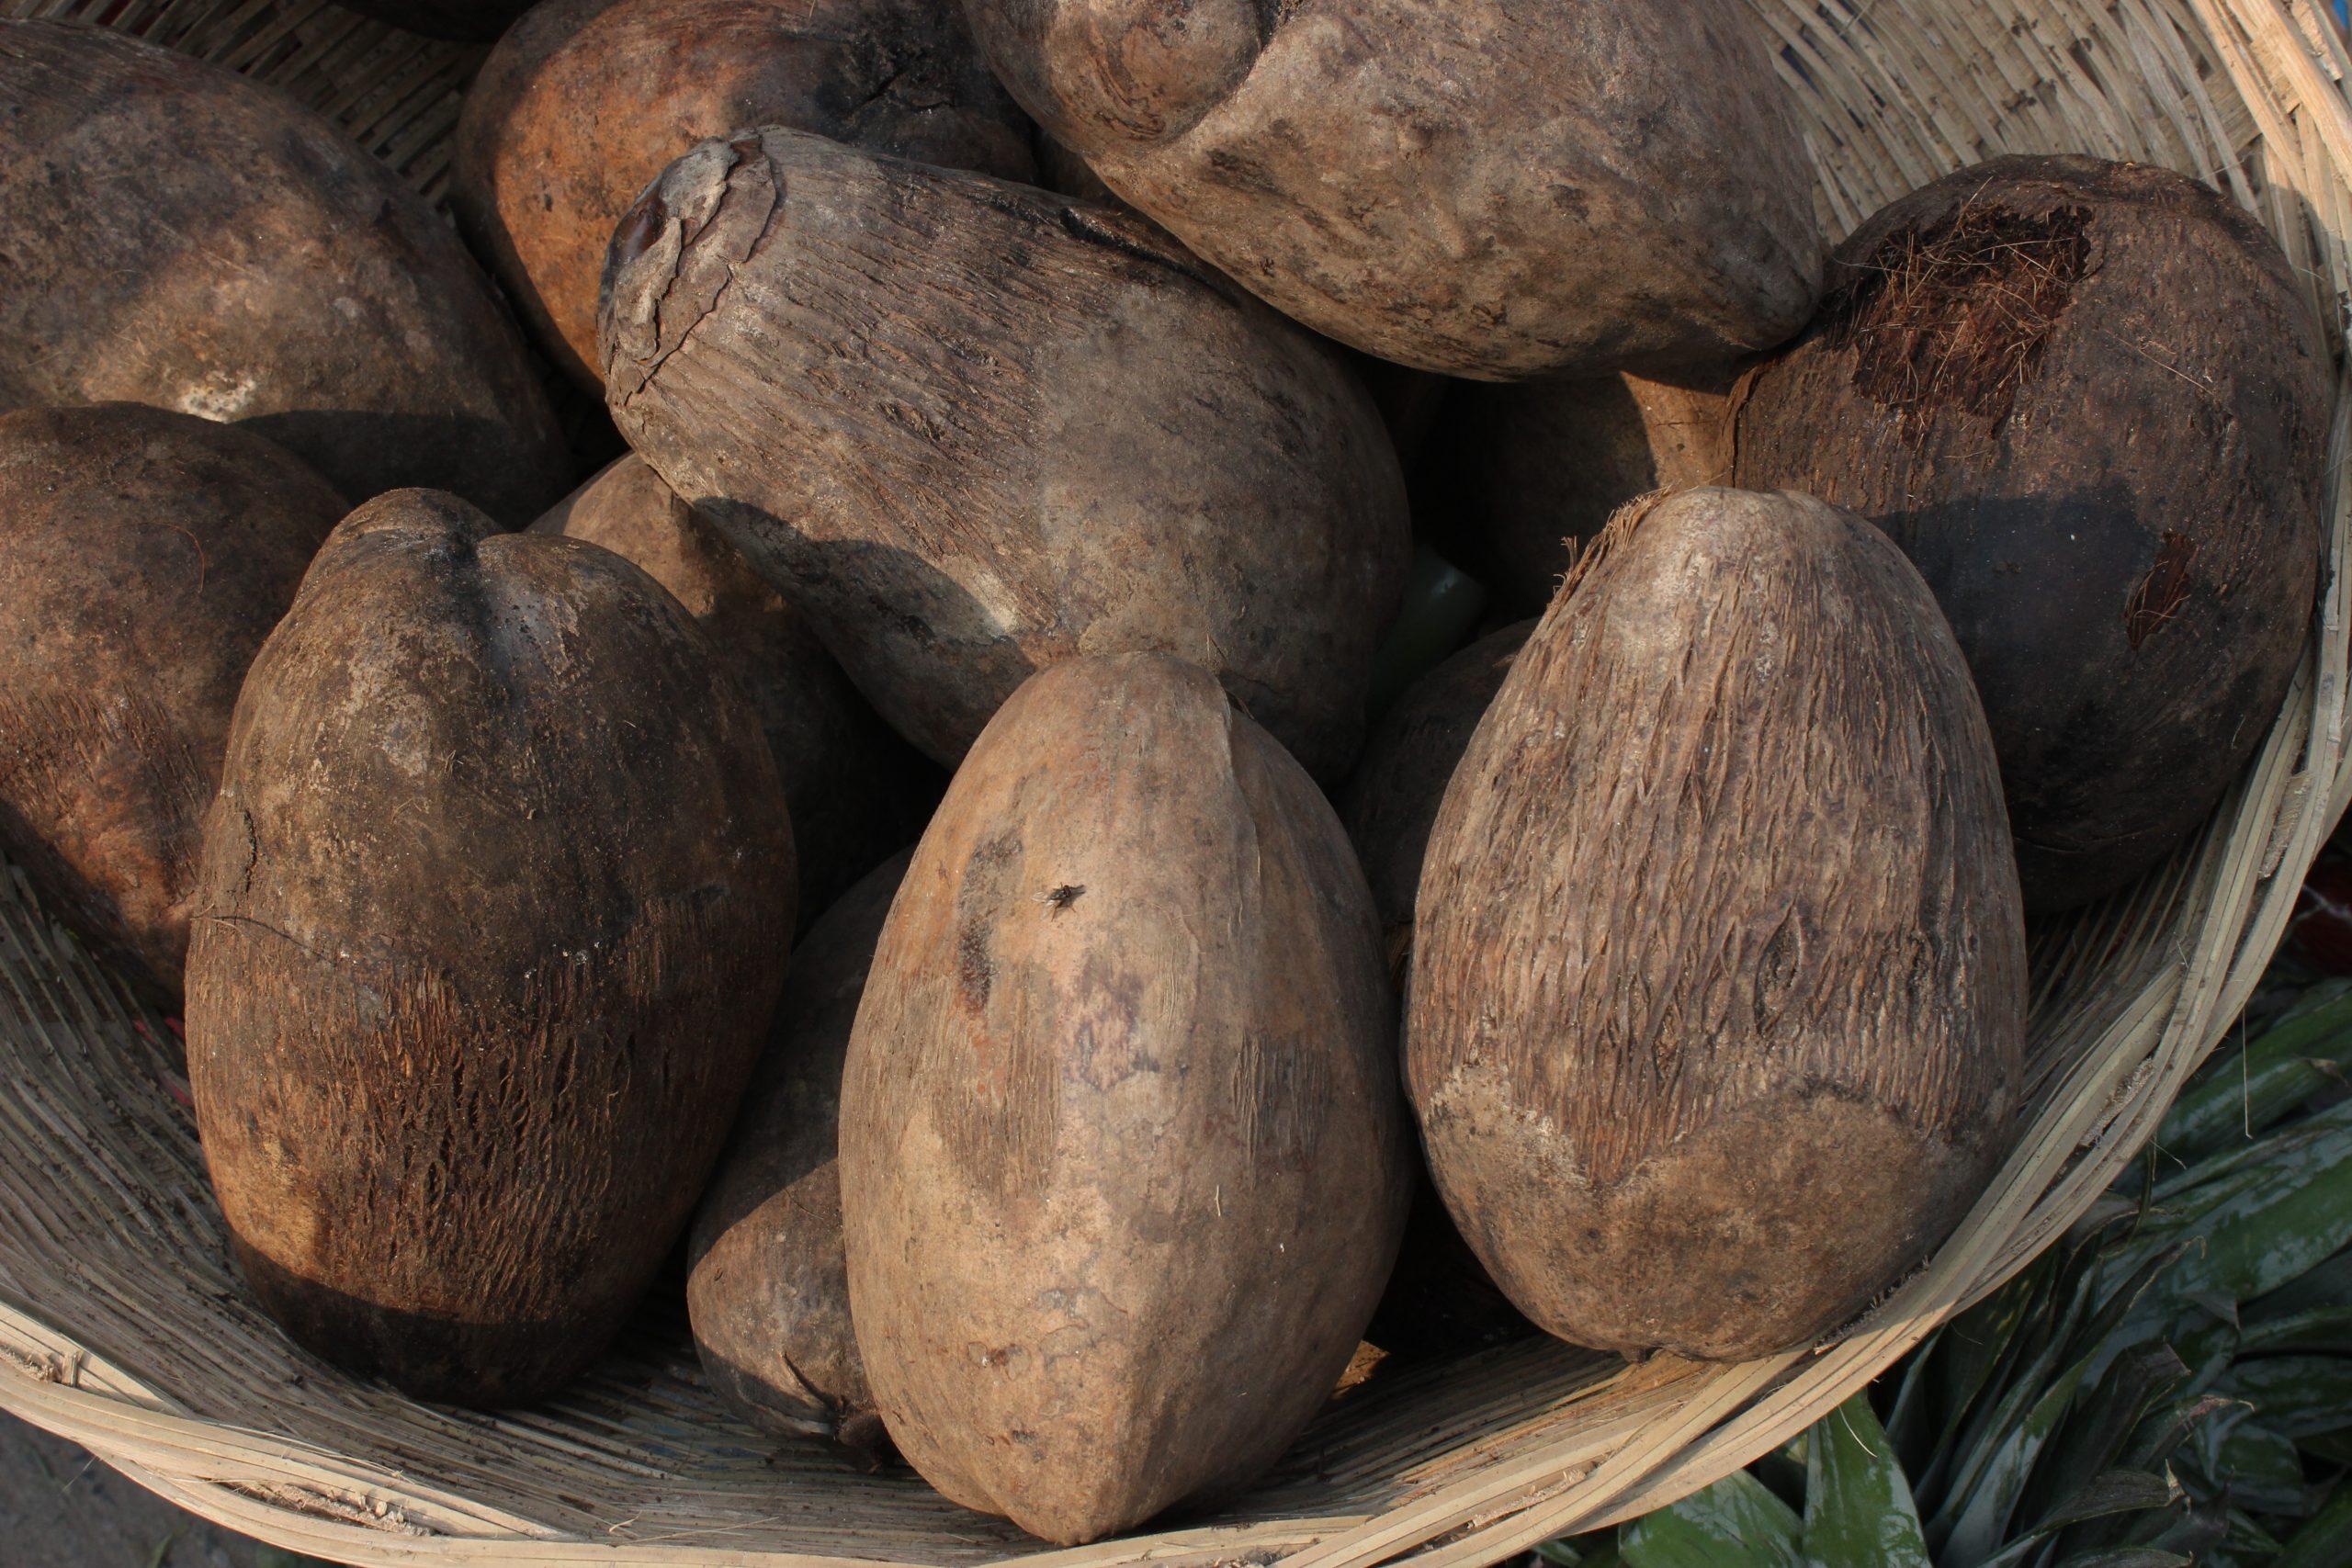 Coconuts in basket